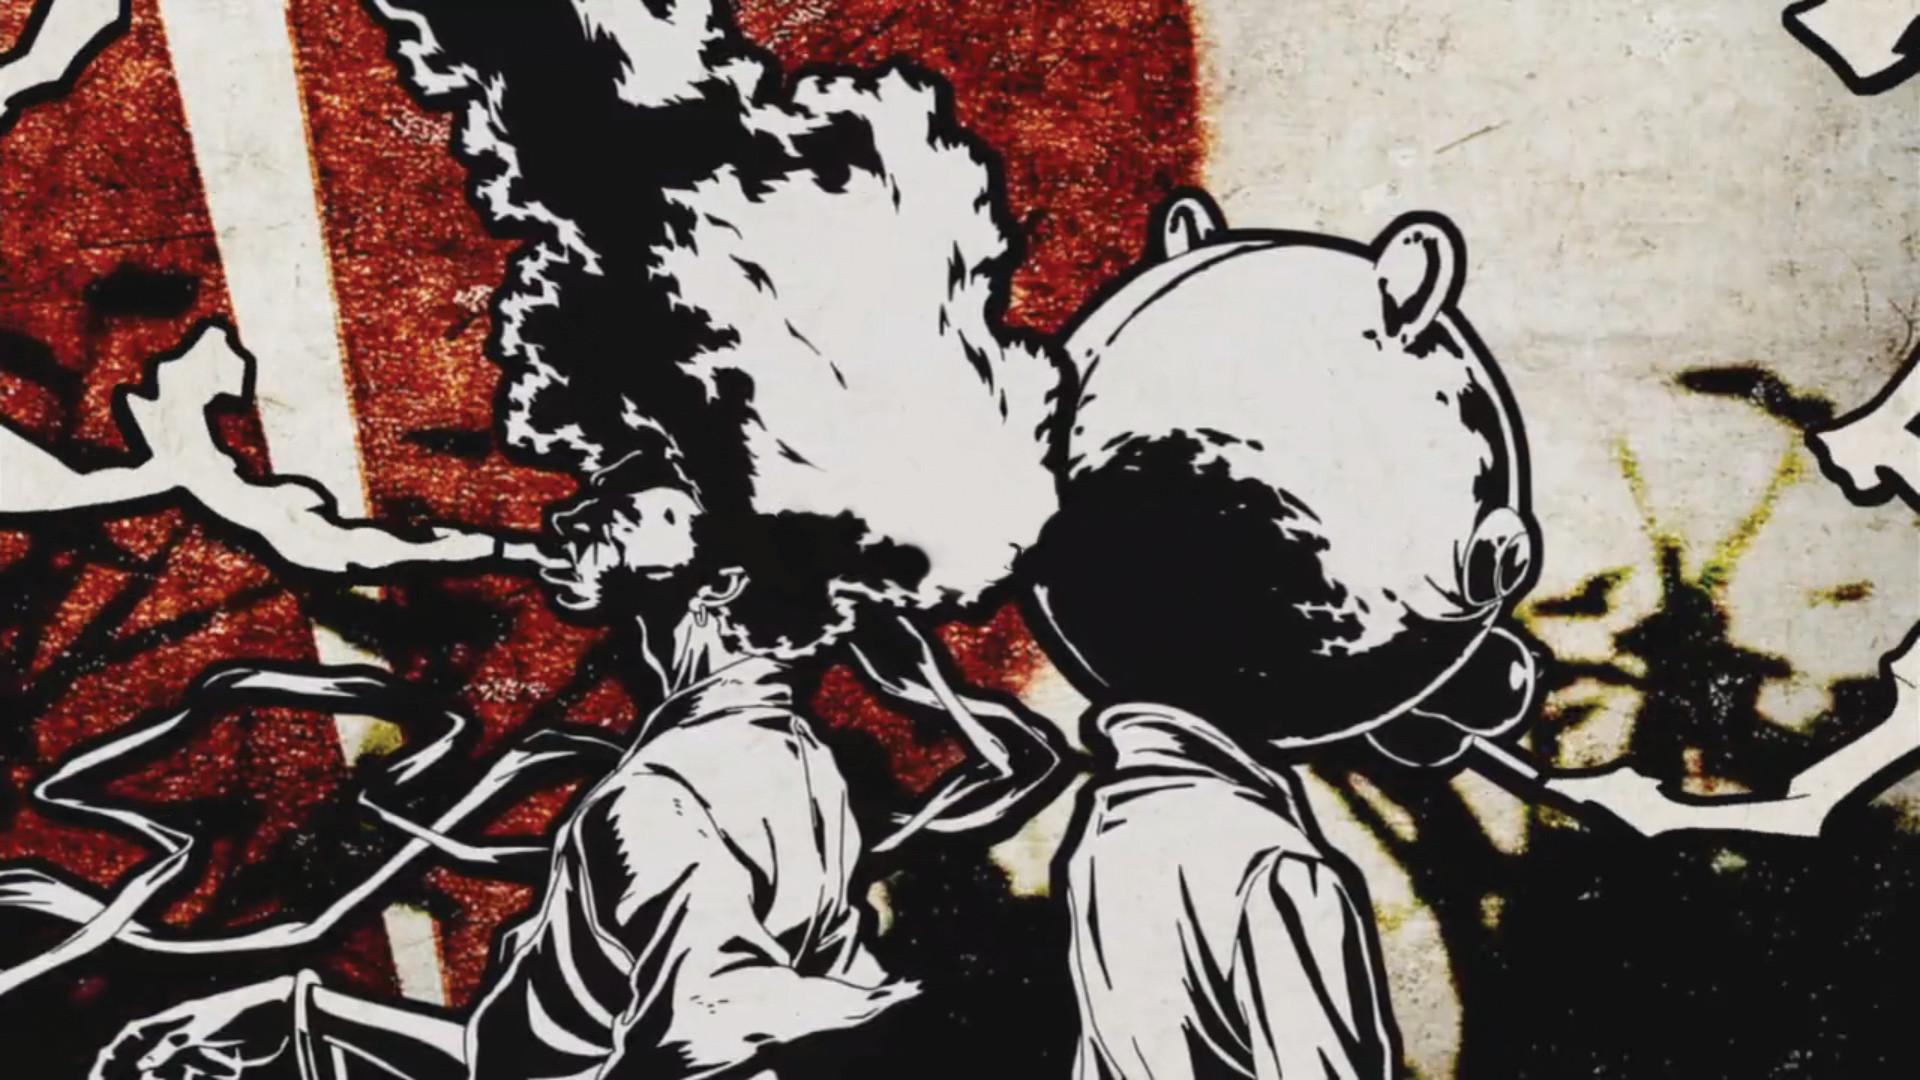 Res: 1920x1080, Afro Samurai Wallpaper HD, ID: IGD315, Londa Rodriguez